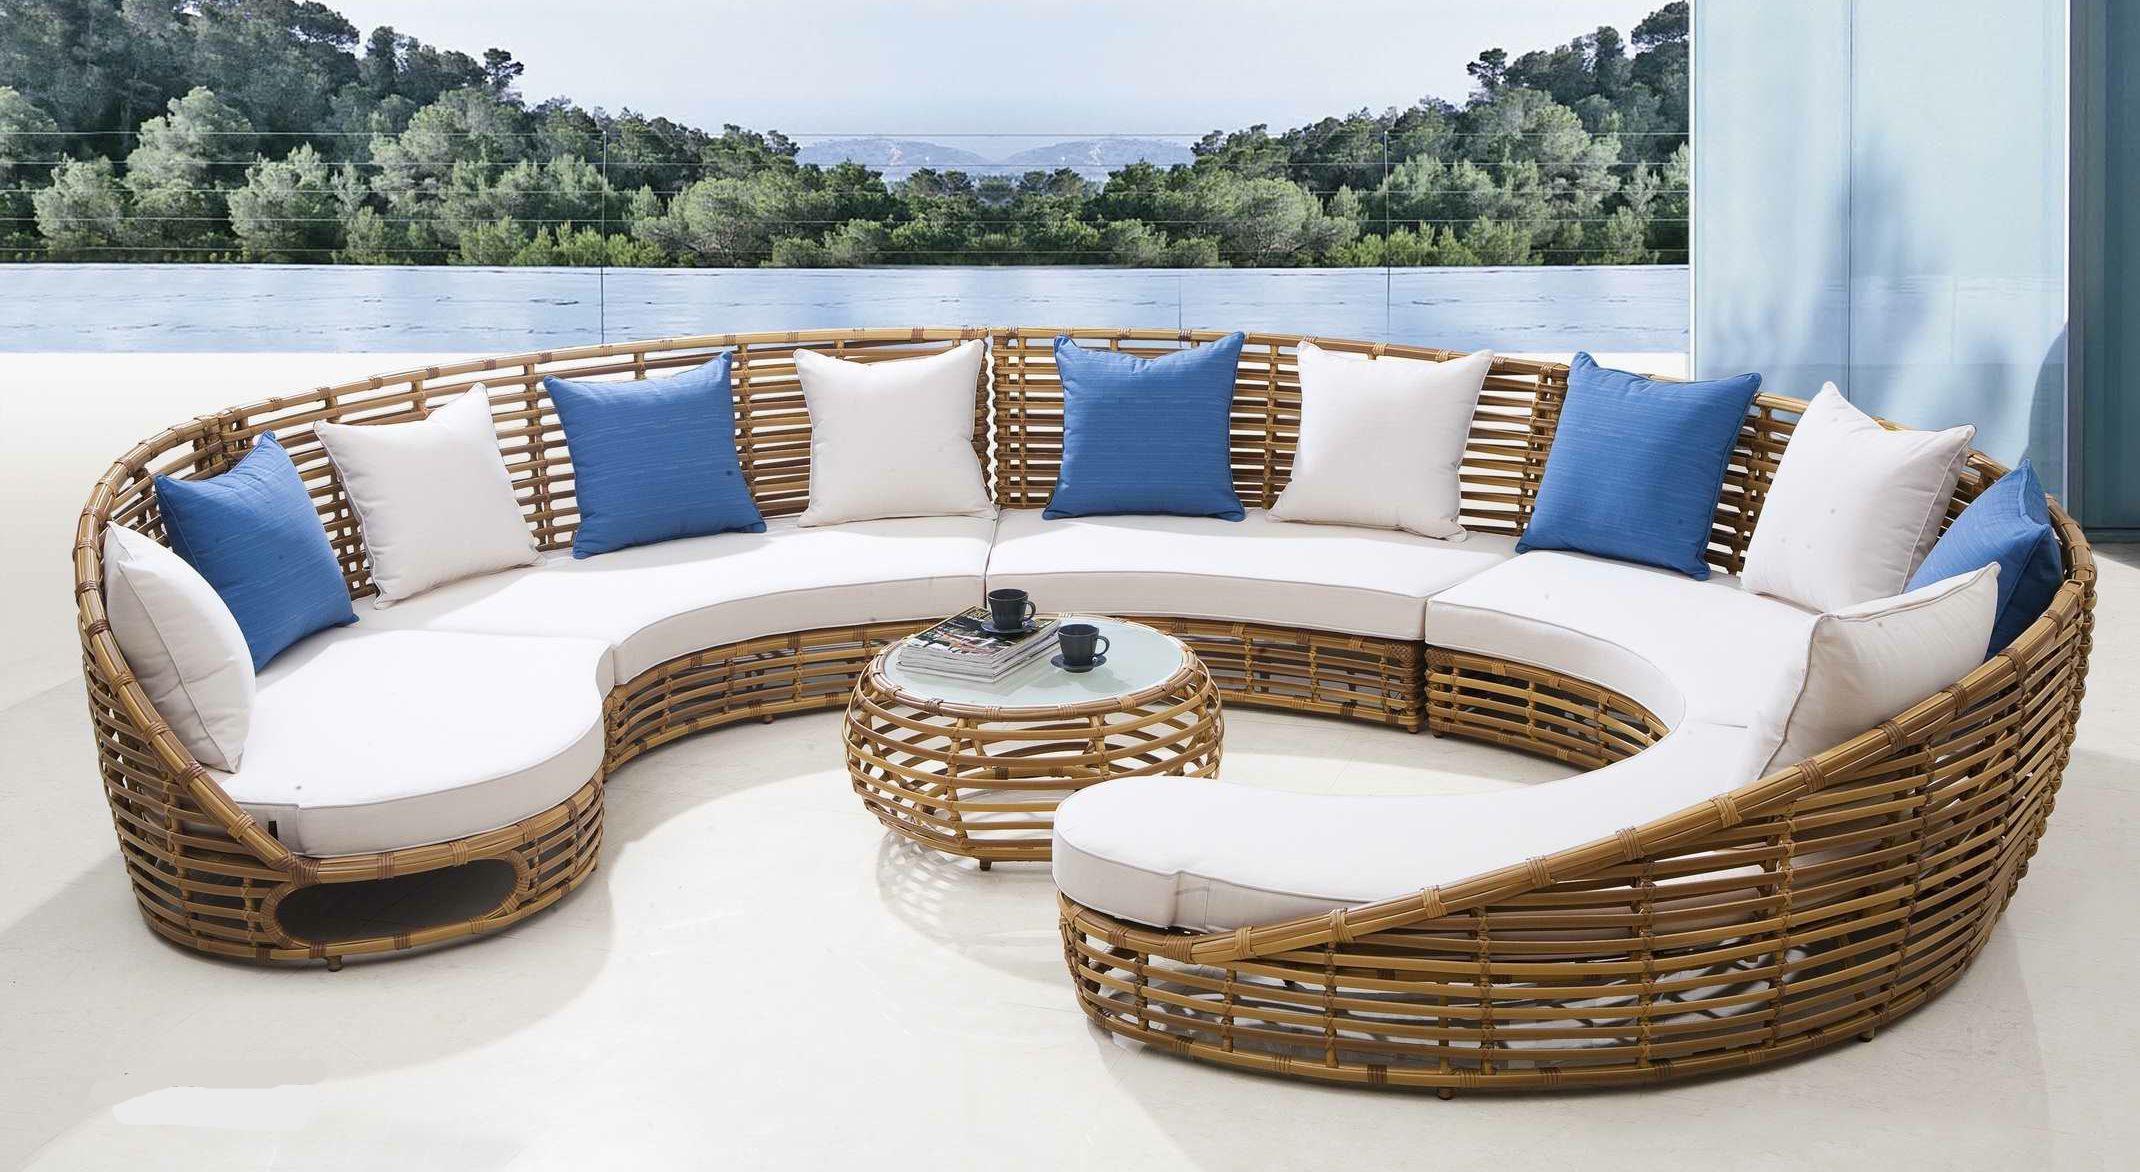 Super Chewy Patio Furniture Cushions Thick   Outdoor Wicker ... intérieur Salon De Jardin Artelia